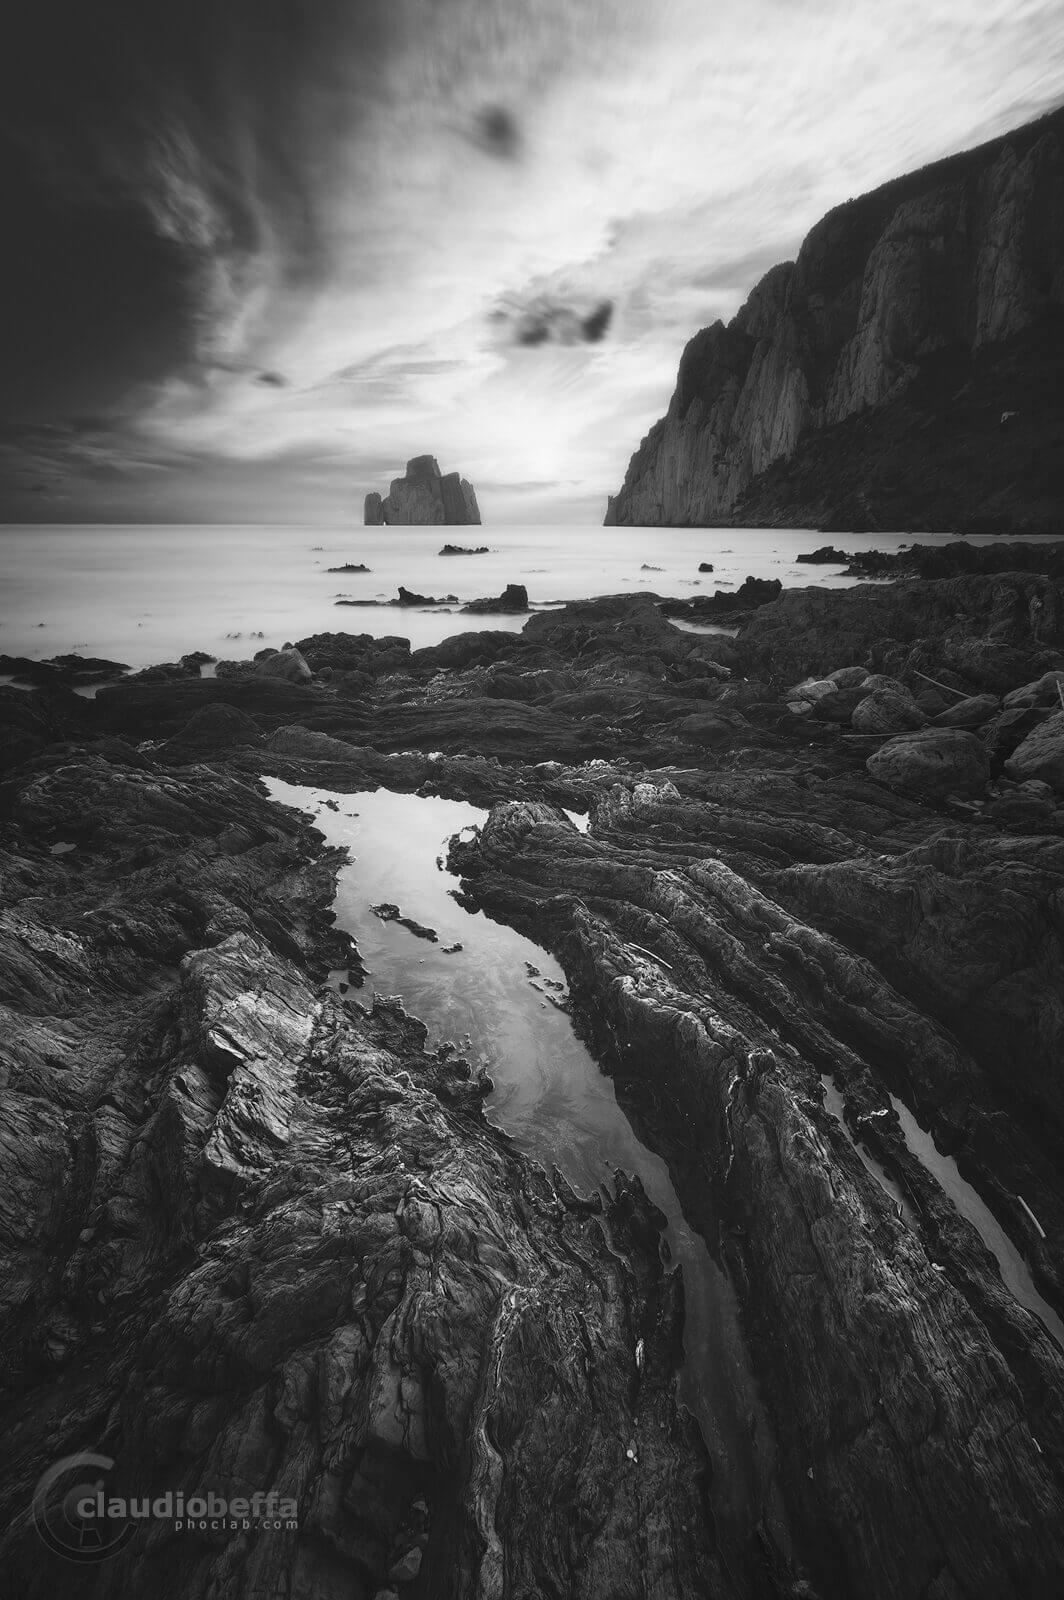 Slits, landscape ,seascape, rocks, stones, island, sea, sardinia, italy, long exposure, black and white